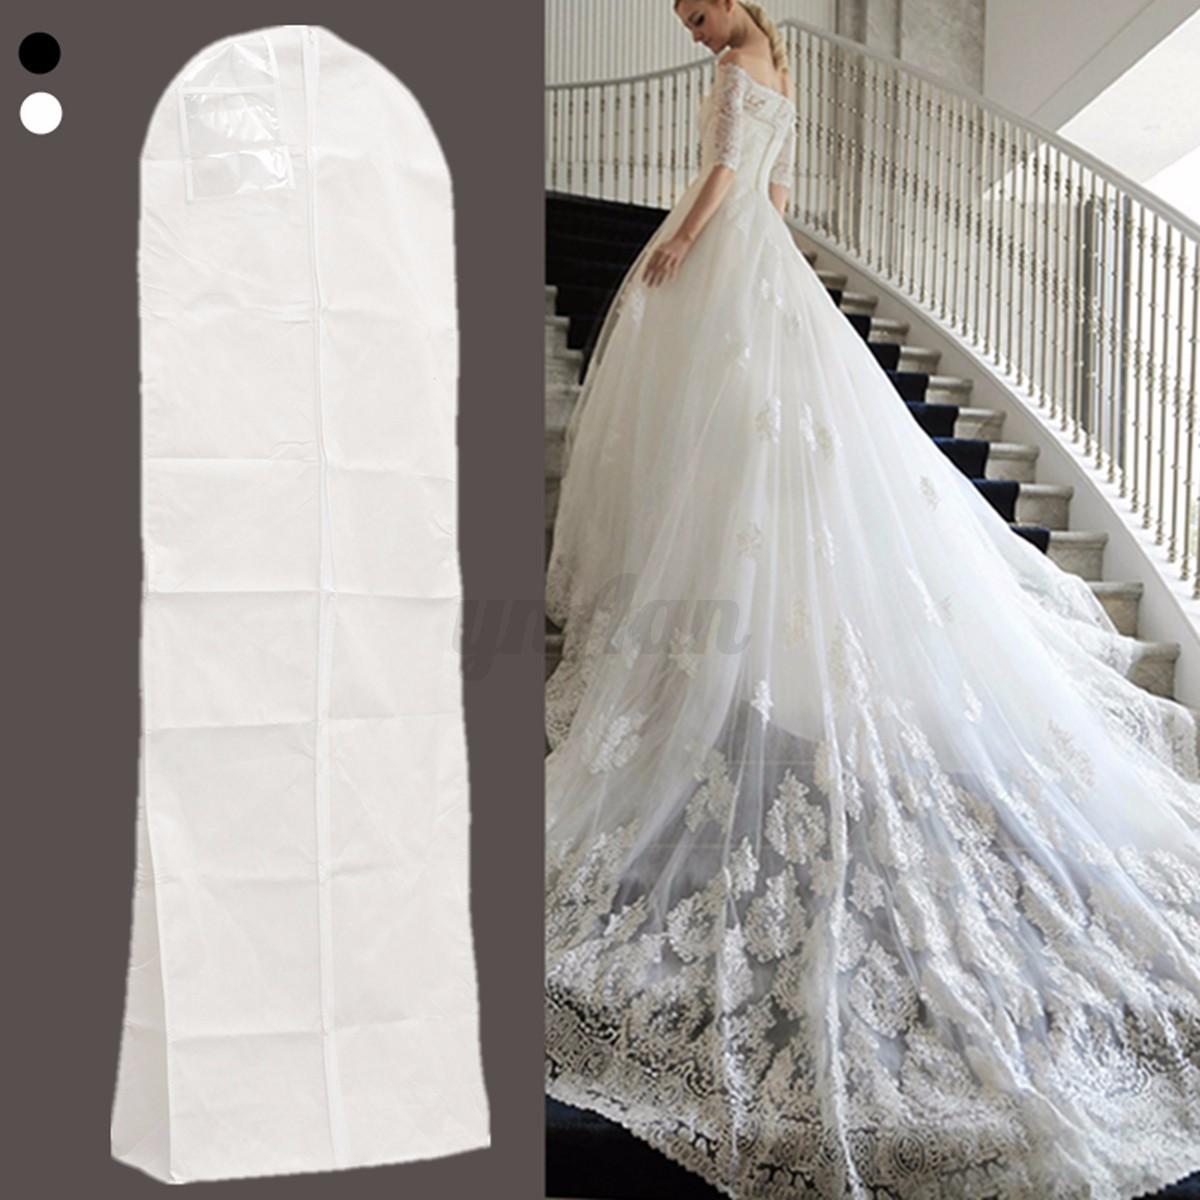 breathable bridal gown dust cover garment clothes storage zip bag wedding dress ebay. Black Bedroom Furniture Sets. Home Design Ideas